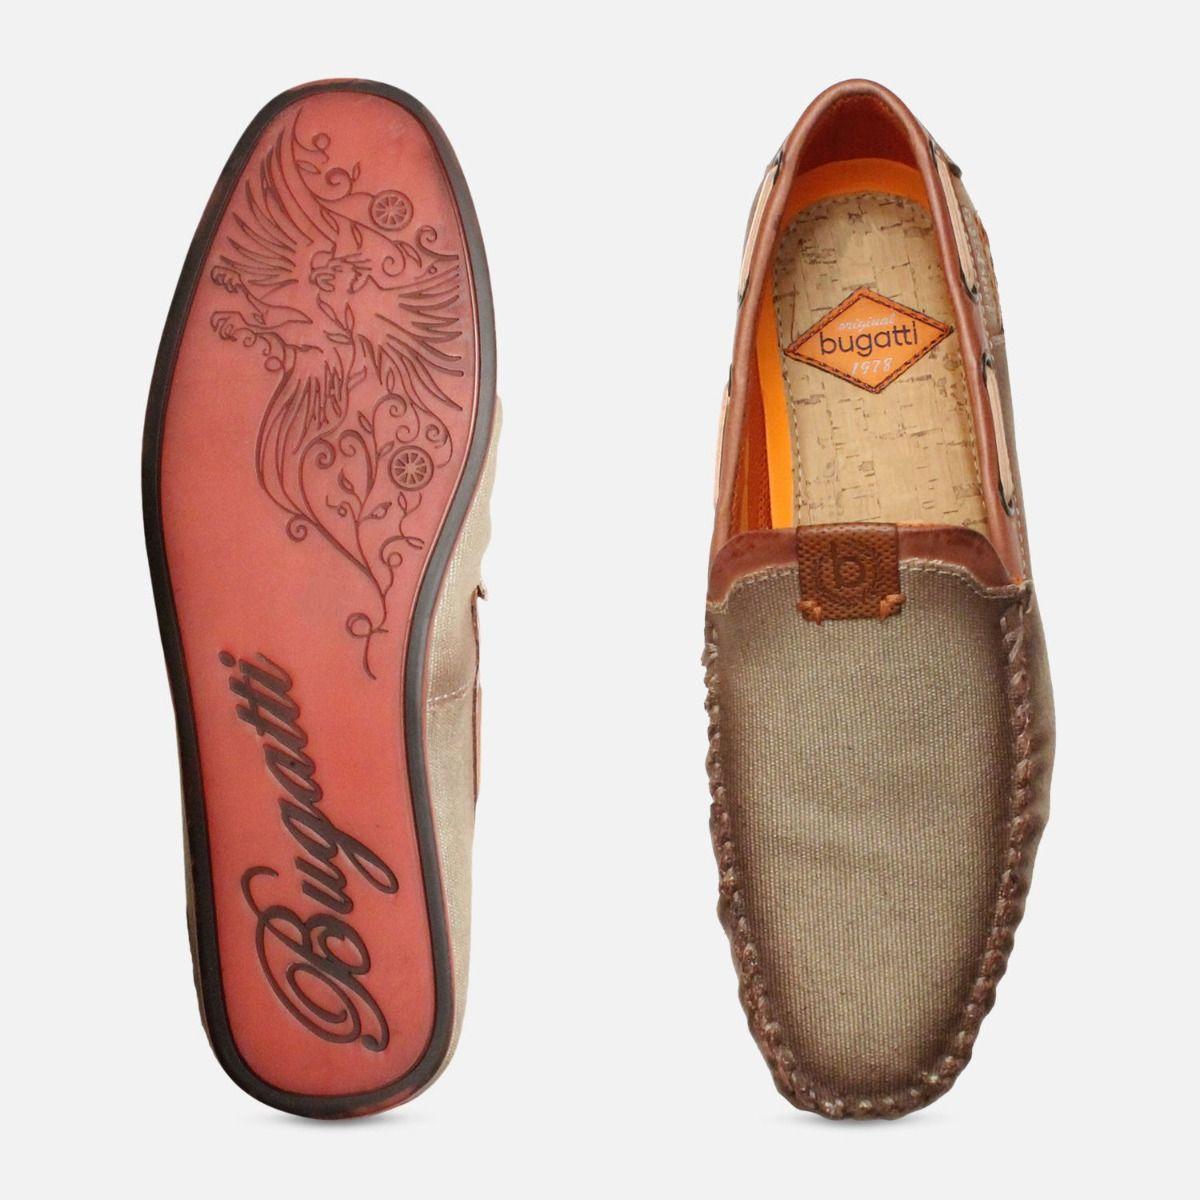 Smoked Designer Bugatti Loafers in Beige Canvas